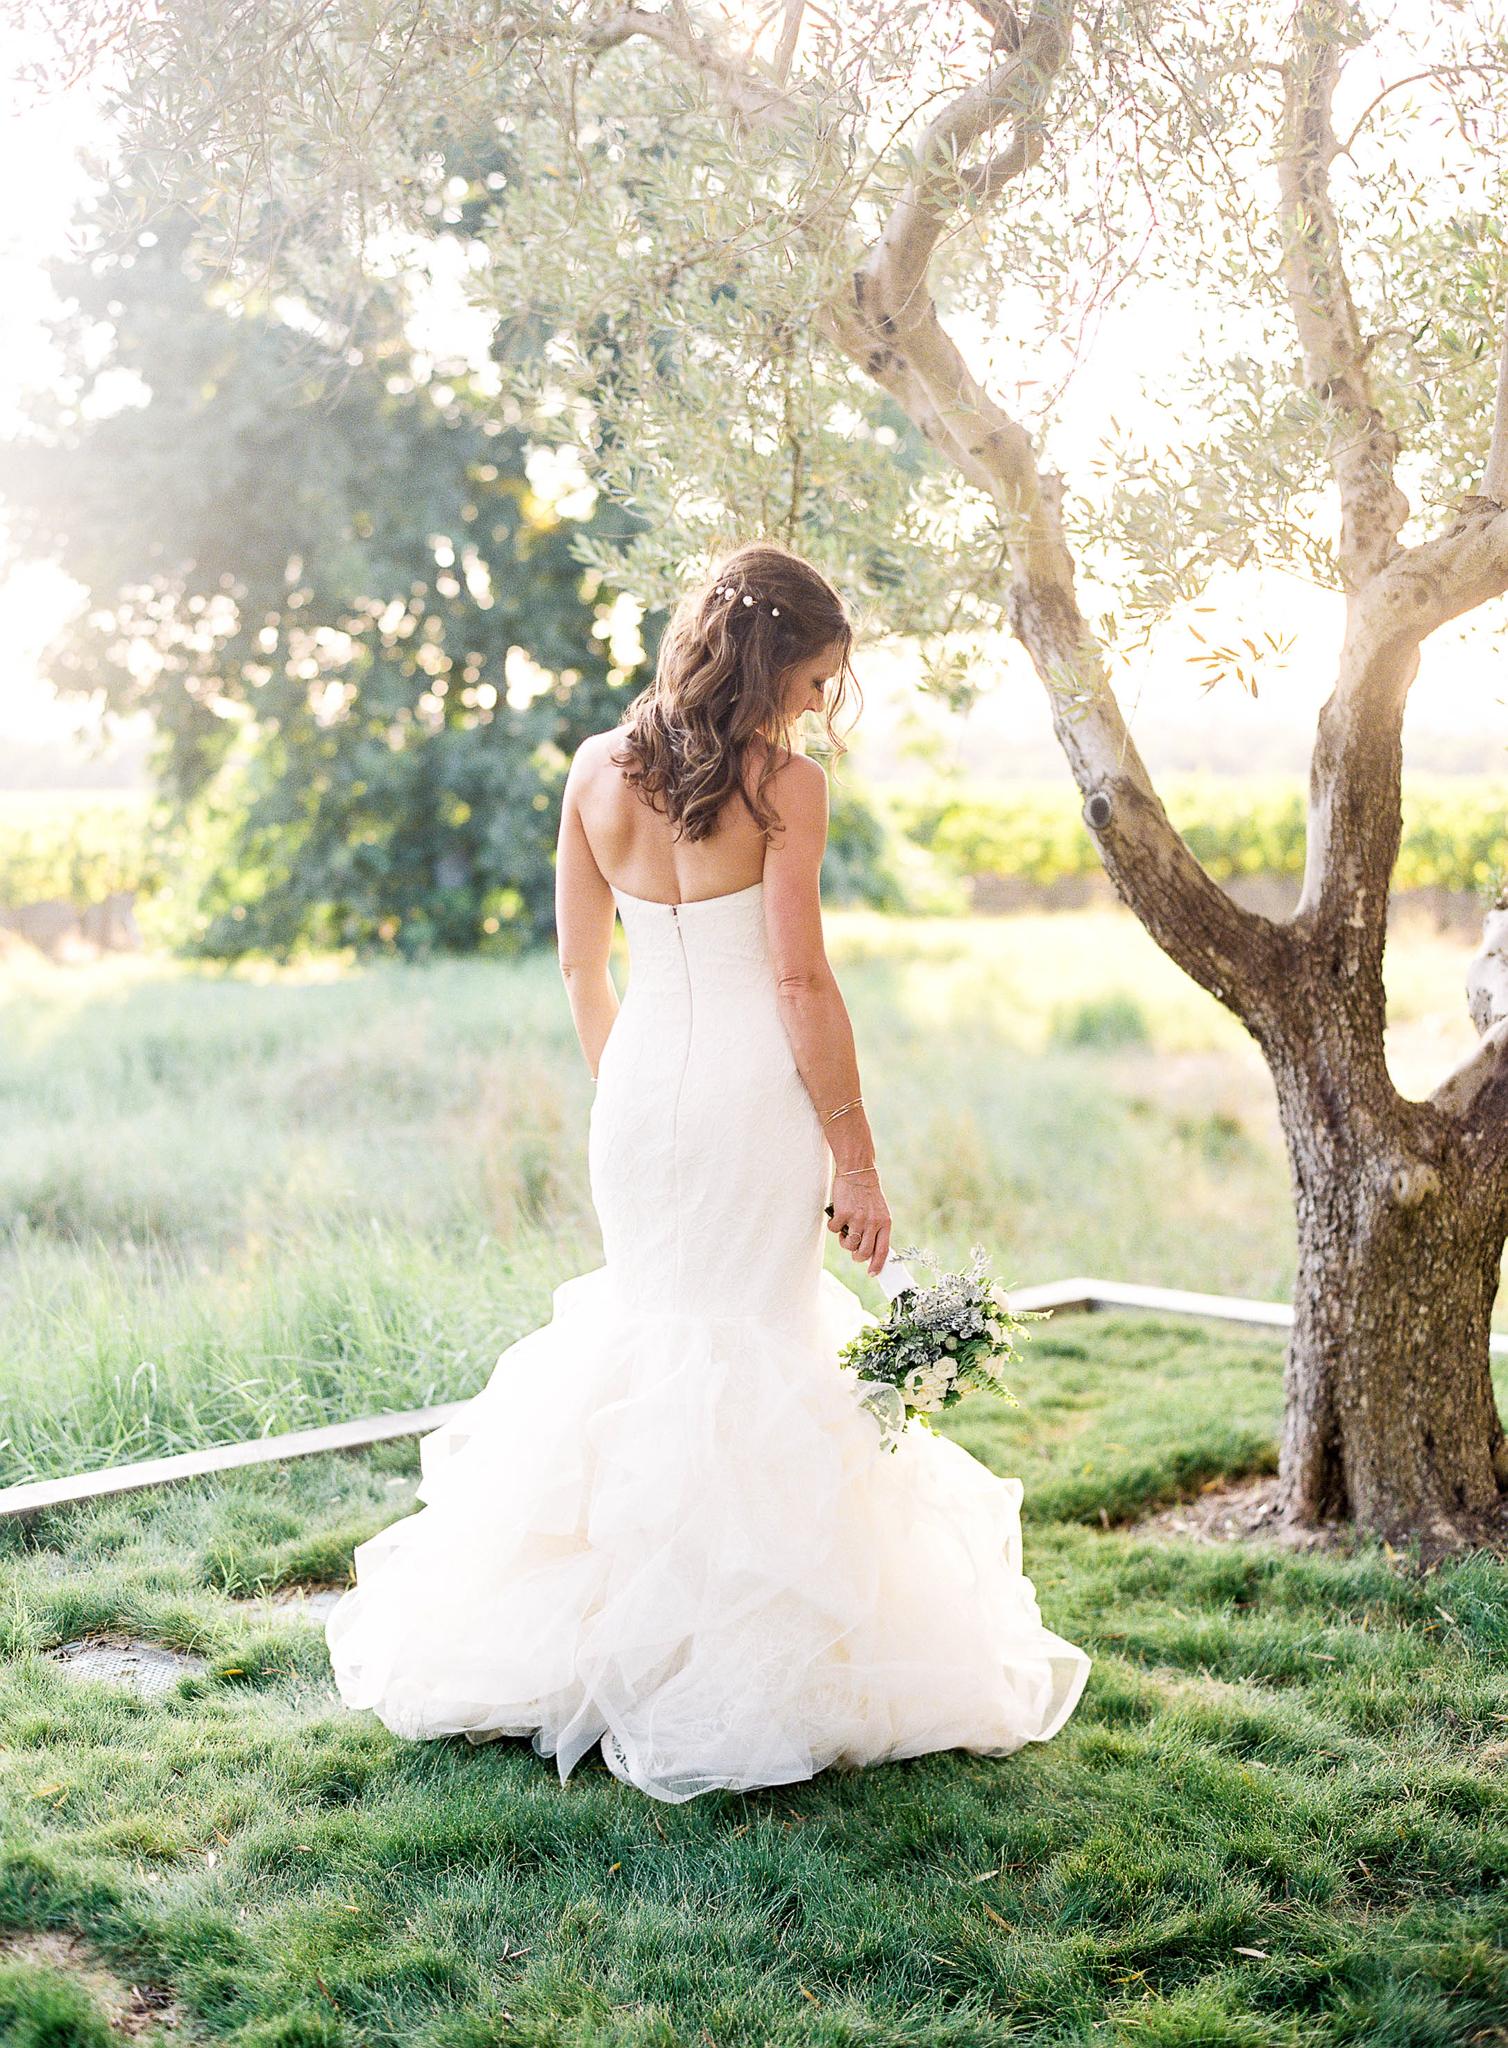 Meghan Mehan Photography - Fine Art Film Wedding Photography - San Francisco   Napa   Sonoma   Big Sur   Chicago   Minneapolis   Milwaukee   Lake Geneva   Door County   Wisconsin 054.jpg